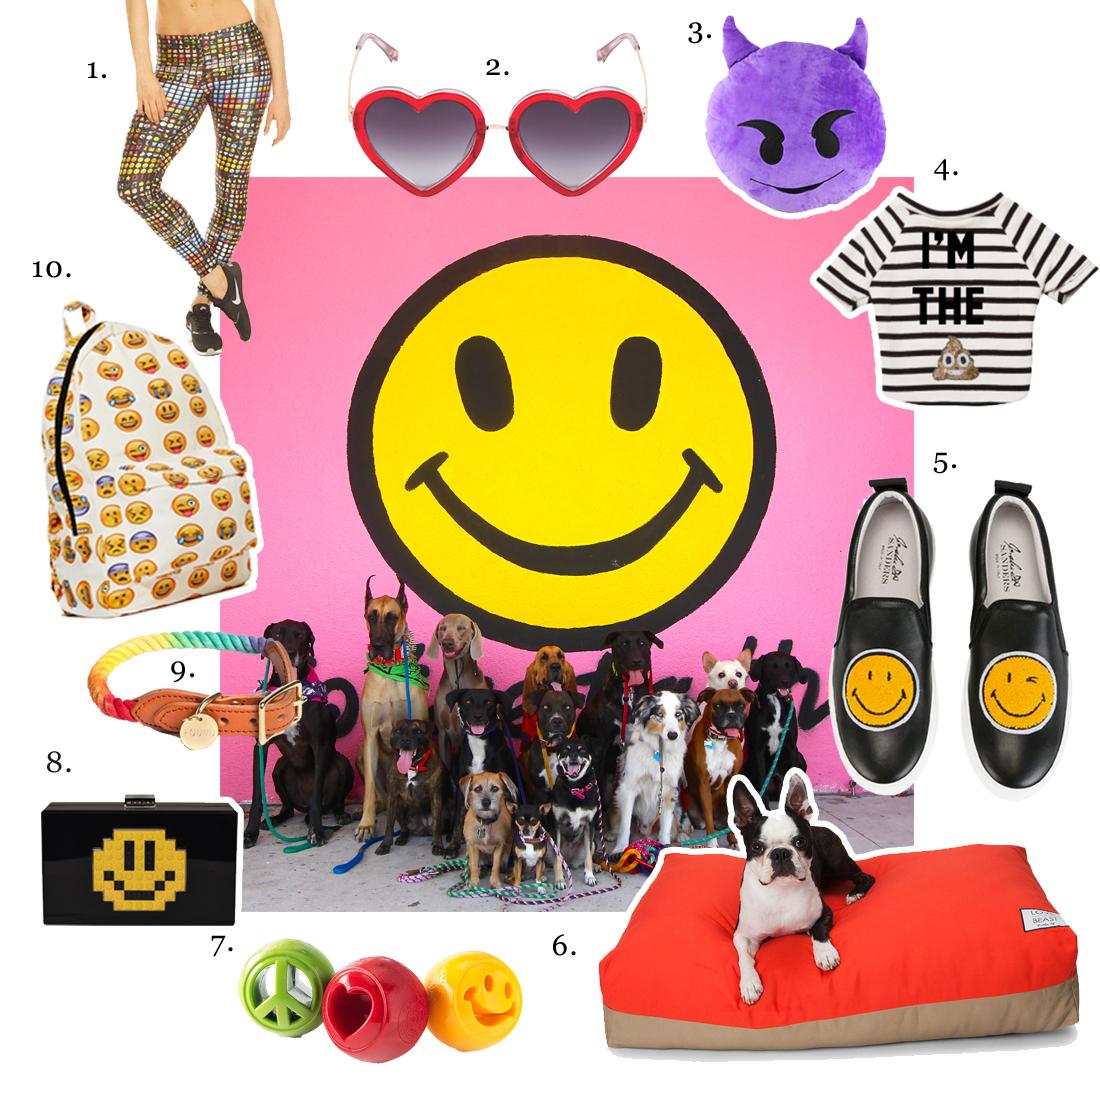 1. Zara Terez, Women's Emoji Performance Leggings 2. Markus Lupfer, Glitter Heart Sunglasses  3. QQ, Purple Devil Plush Toy  4. Bow & Drape, U Know It Dog Sweater  5. Joshua Sanders, Smiley Face Slip-on Sneakers  6. Lovethybeast, Flip Stitch Bed in Orange & Khaki  7. Planet Dog, Orbee Tuff Nook Toys  8. Le Petit Joueurs, Grace Smile 9. Found My Animal, Prismic collar  10. Nasty Gal,  Emoji-nal Backpack  Center photo courtesy of TheBarkhaus